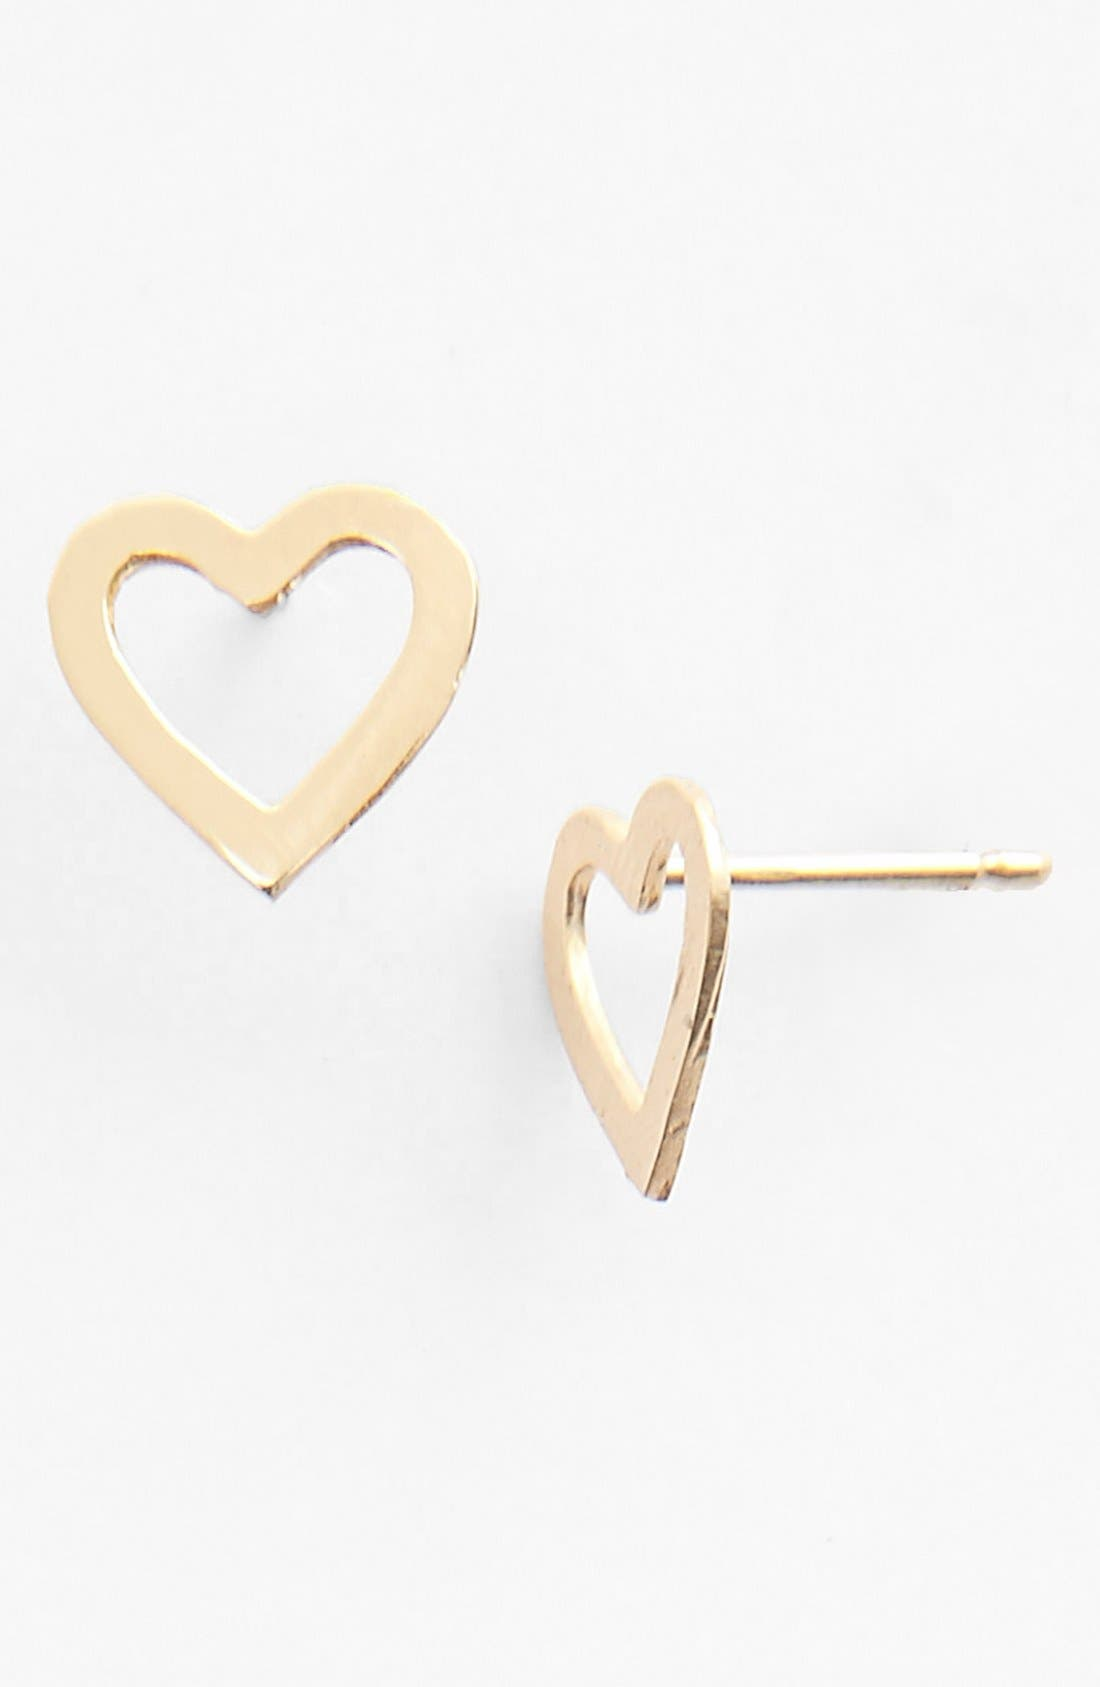 Main Image - Lana Jewelry 'Spellbound' Heart Stud Earrings